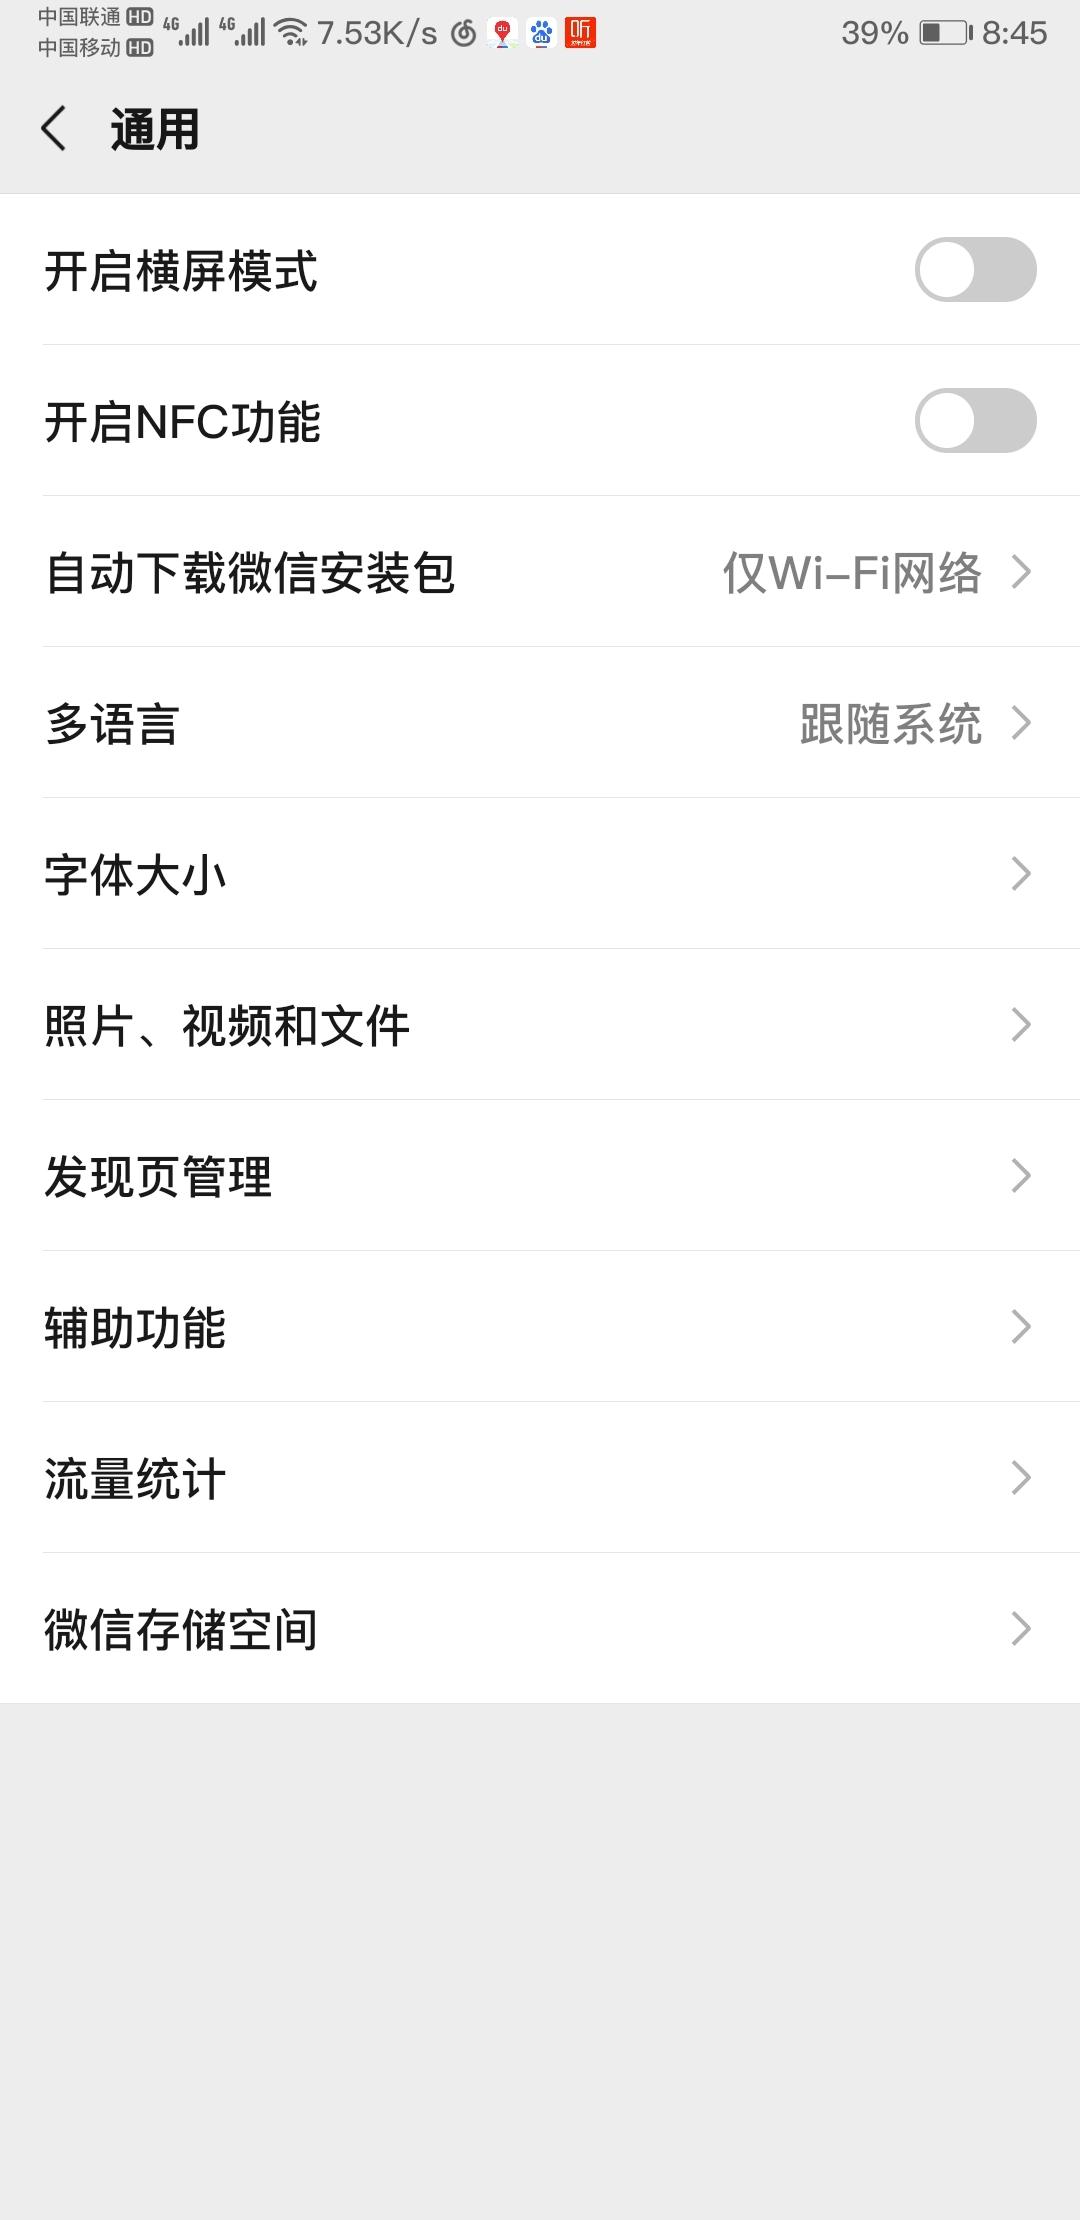 Screenshot_20200725_204521_com.tencent.mm.jpg